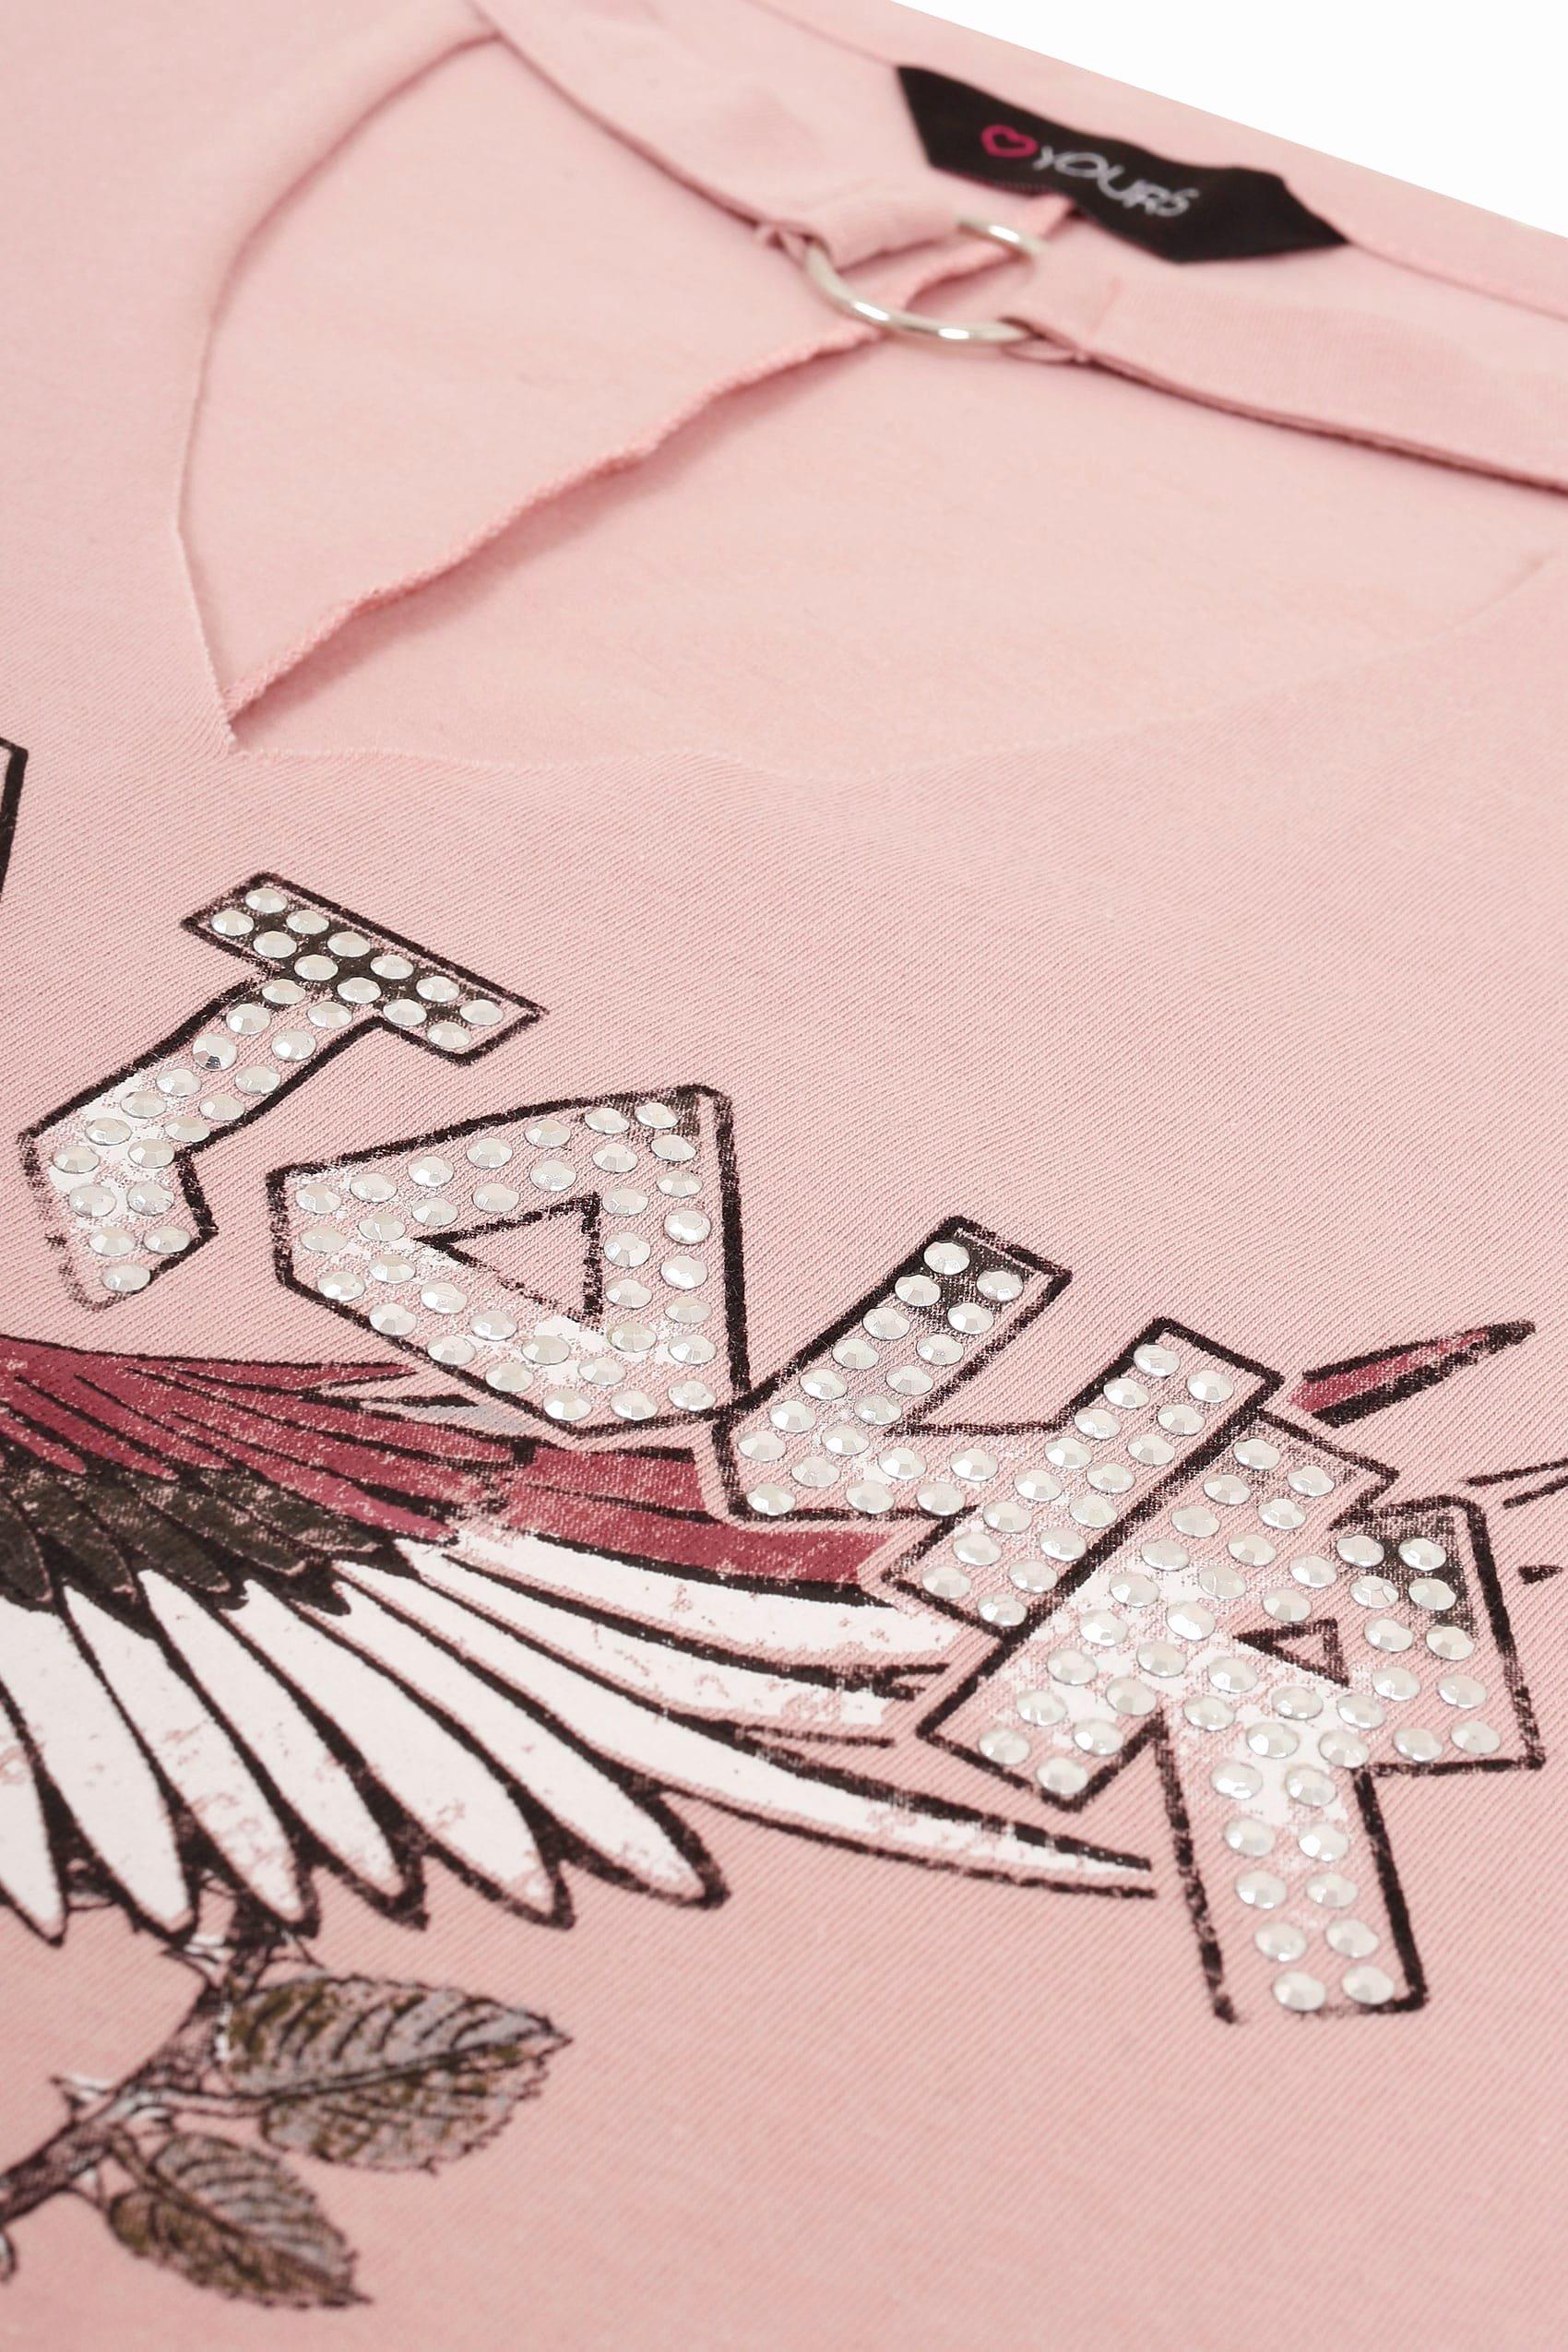 rosa slogan t shirt mit nietenverzierung und choker ausschnitt p